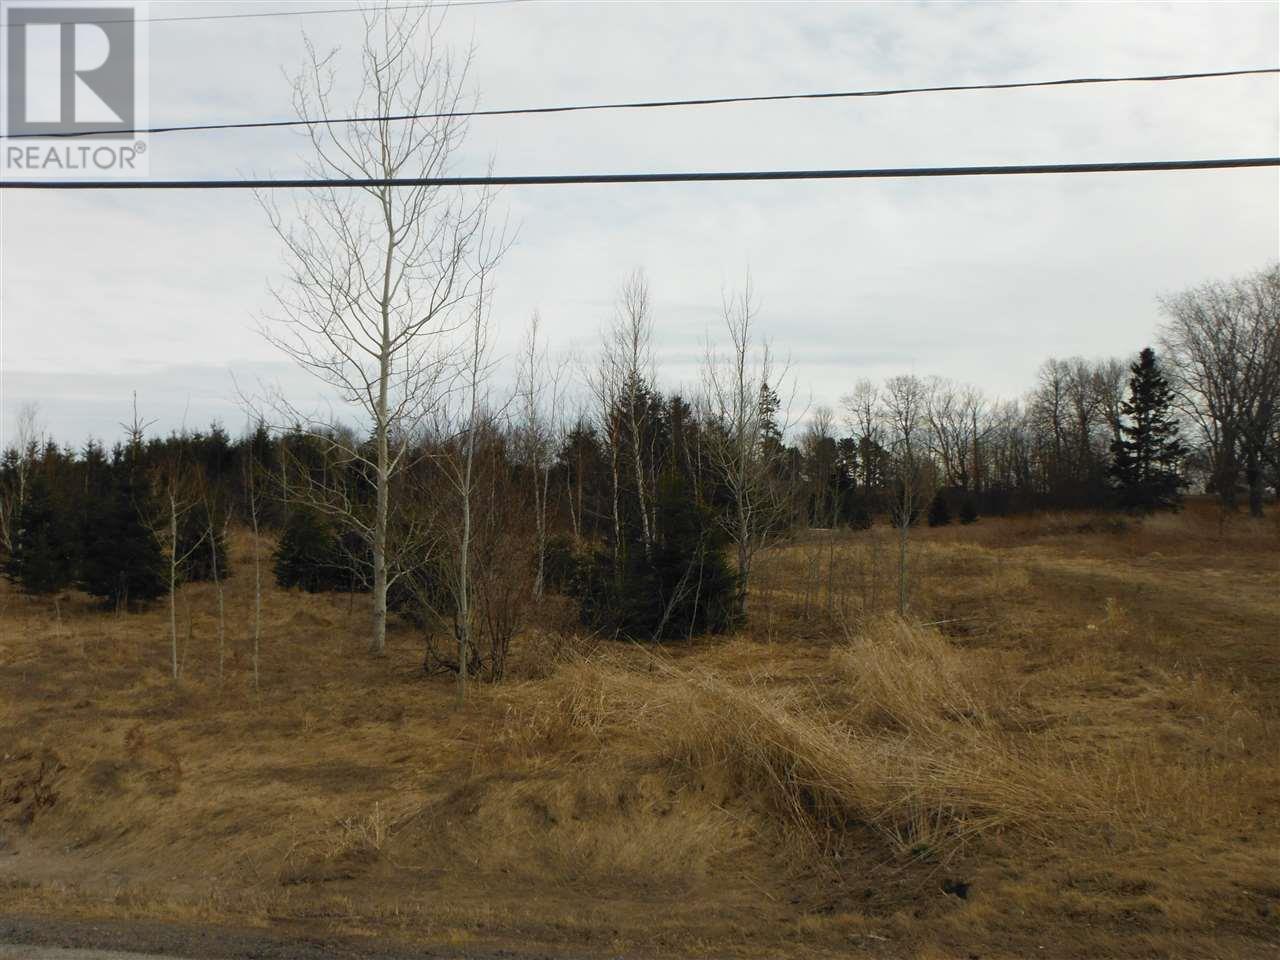 Lot 1-16 Royalty Junction Road, Charlottetown, Prince Edward Island  C1E 1Z2 - Photo 1 - 202006111